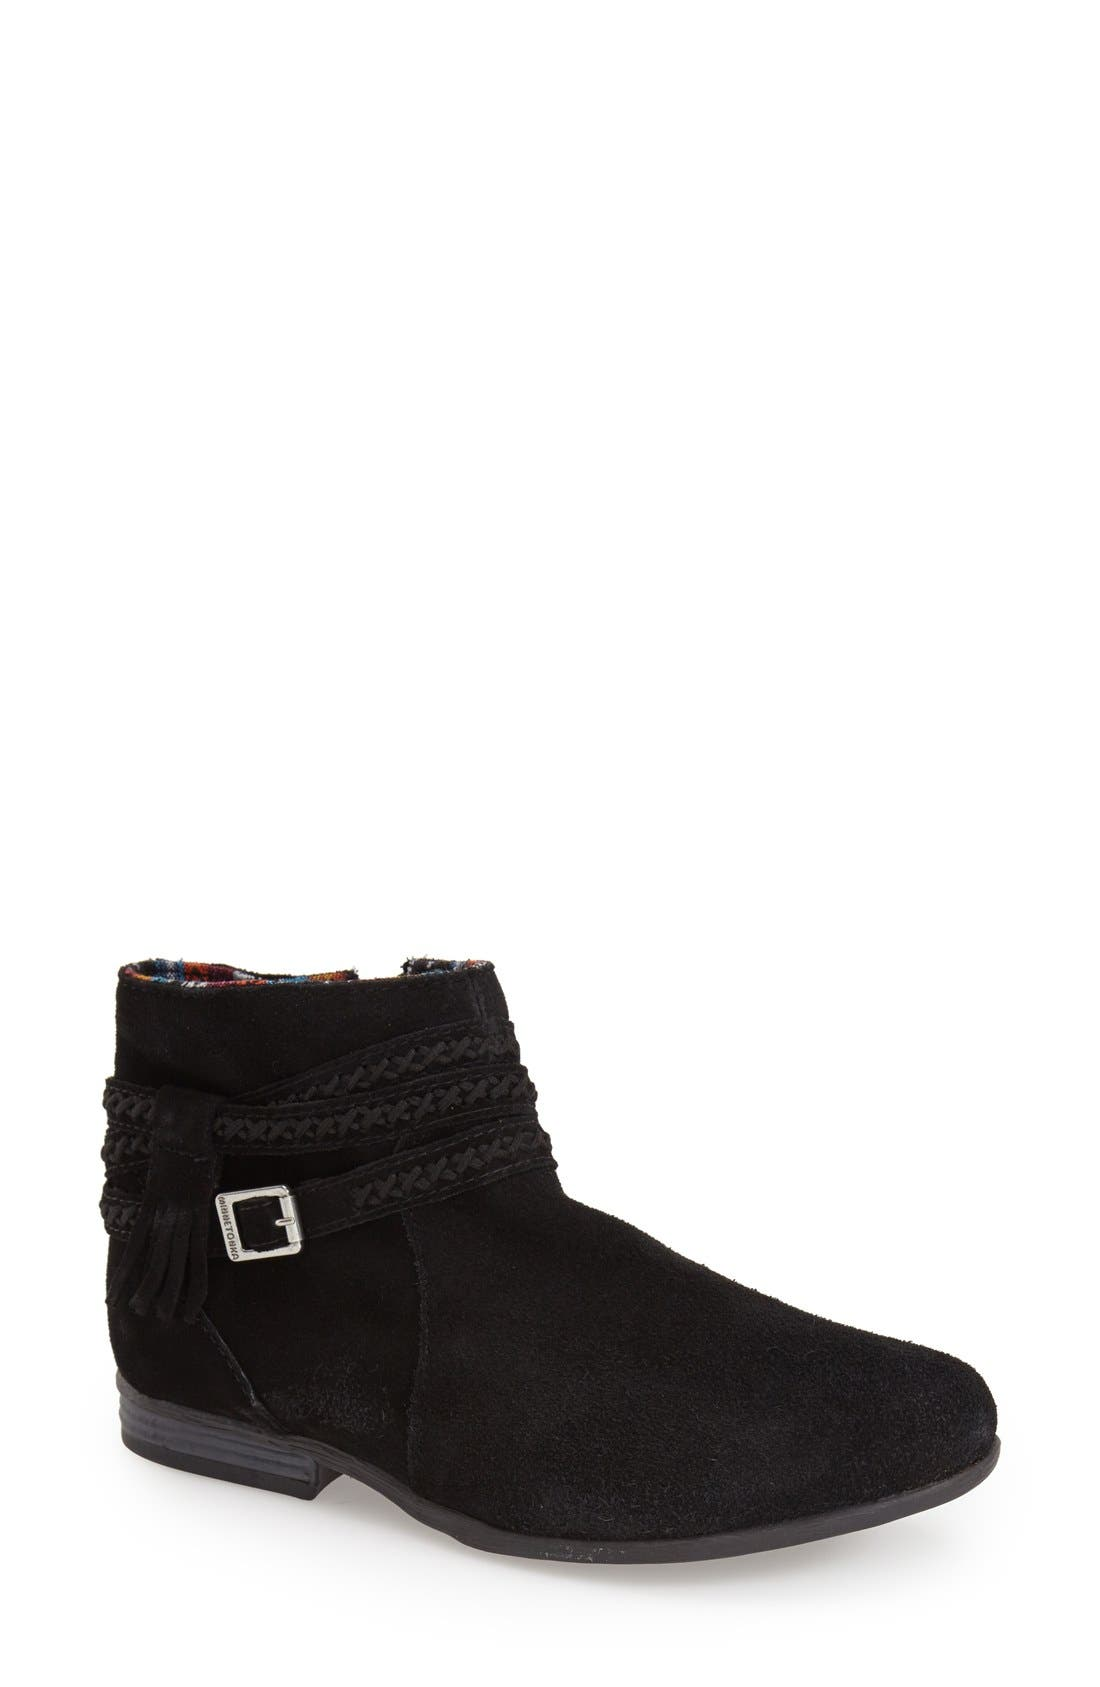 Main Image - Minnetonka'Dixon' Boot (Women)